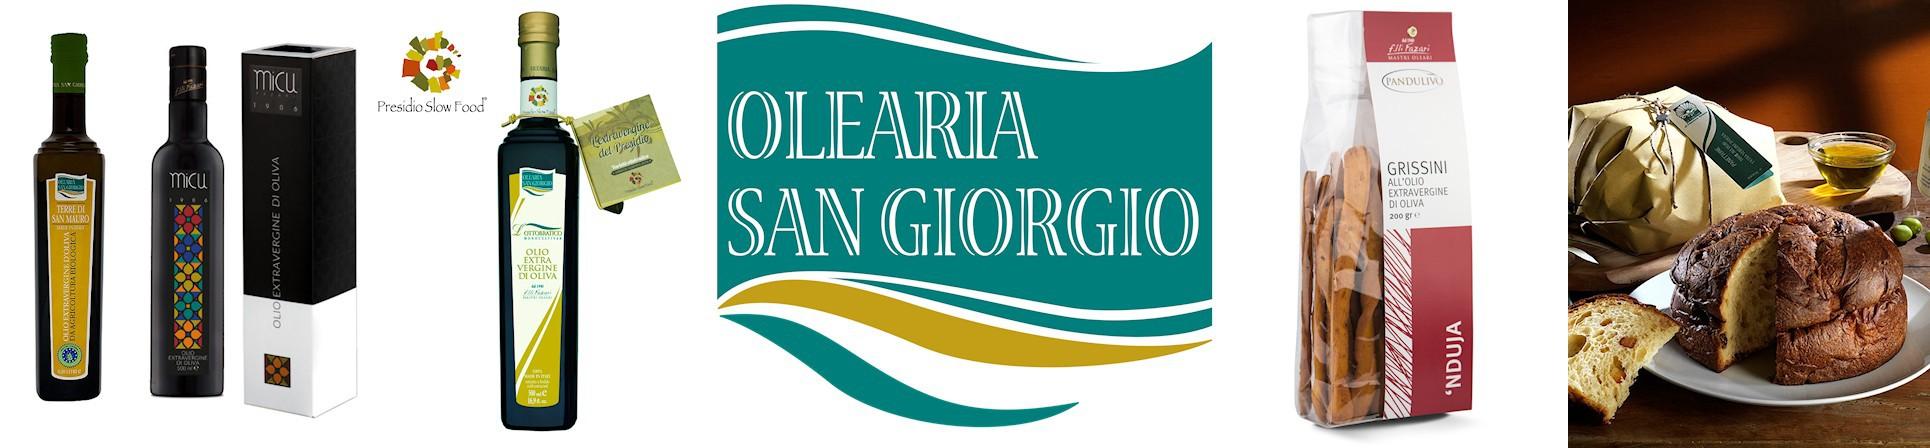 Olearia San Giorgio - Extravergine d'oliva di Calabria - vendita online